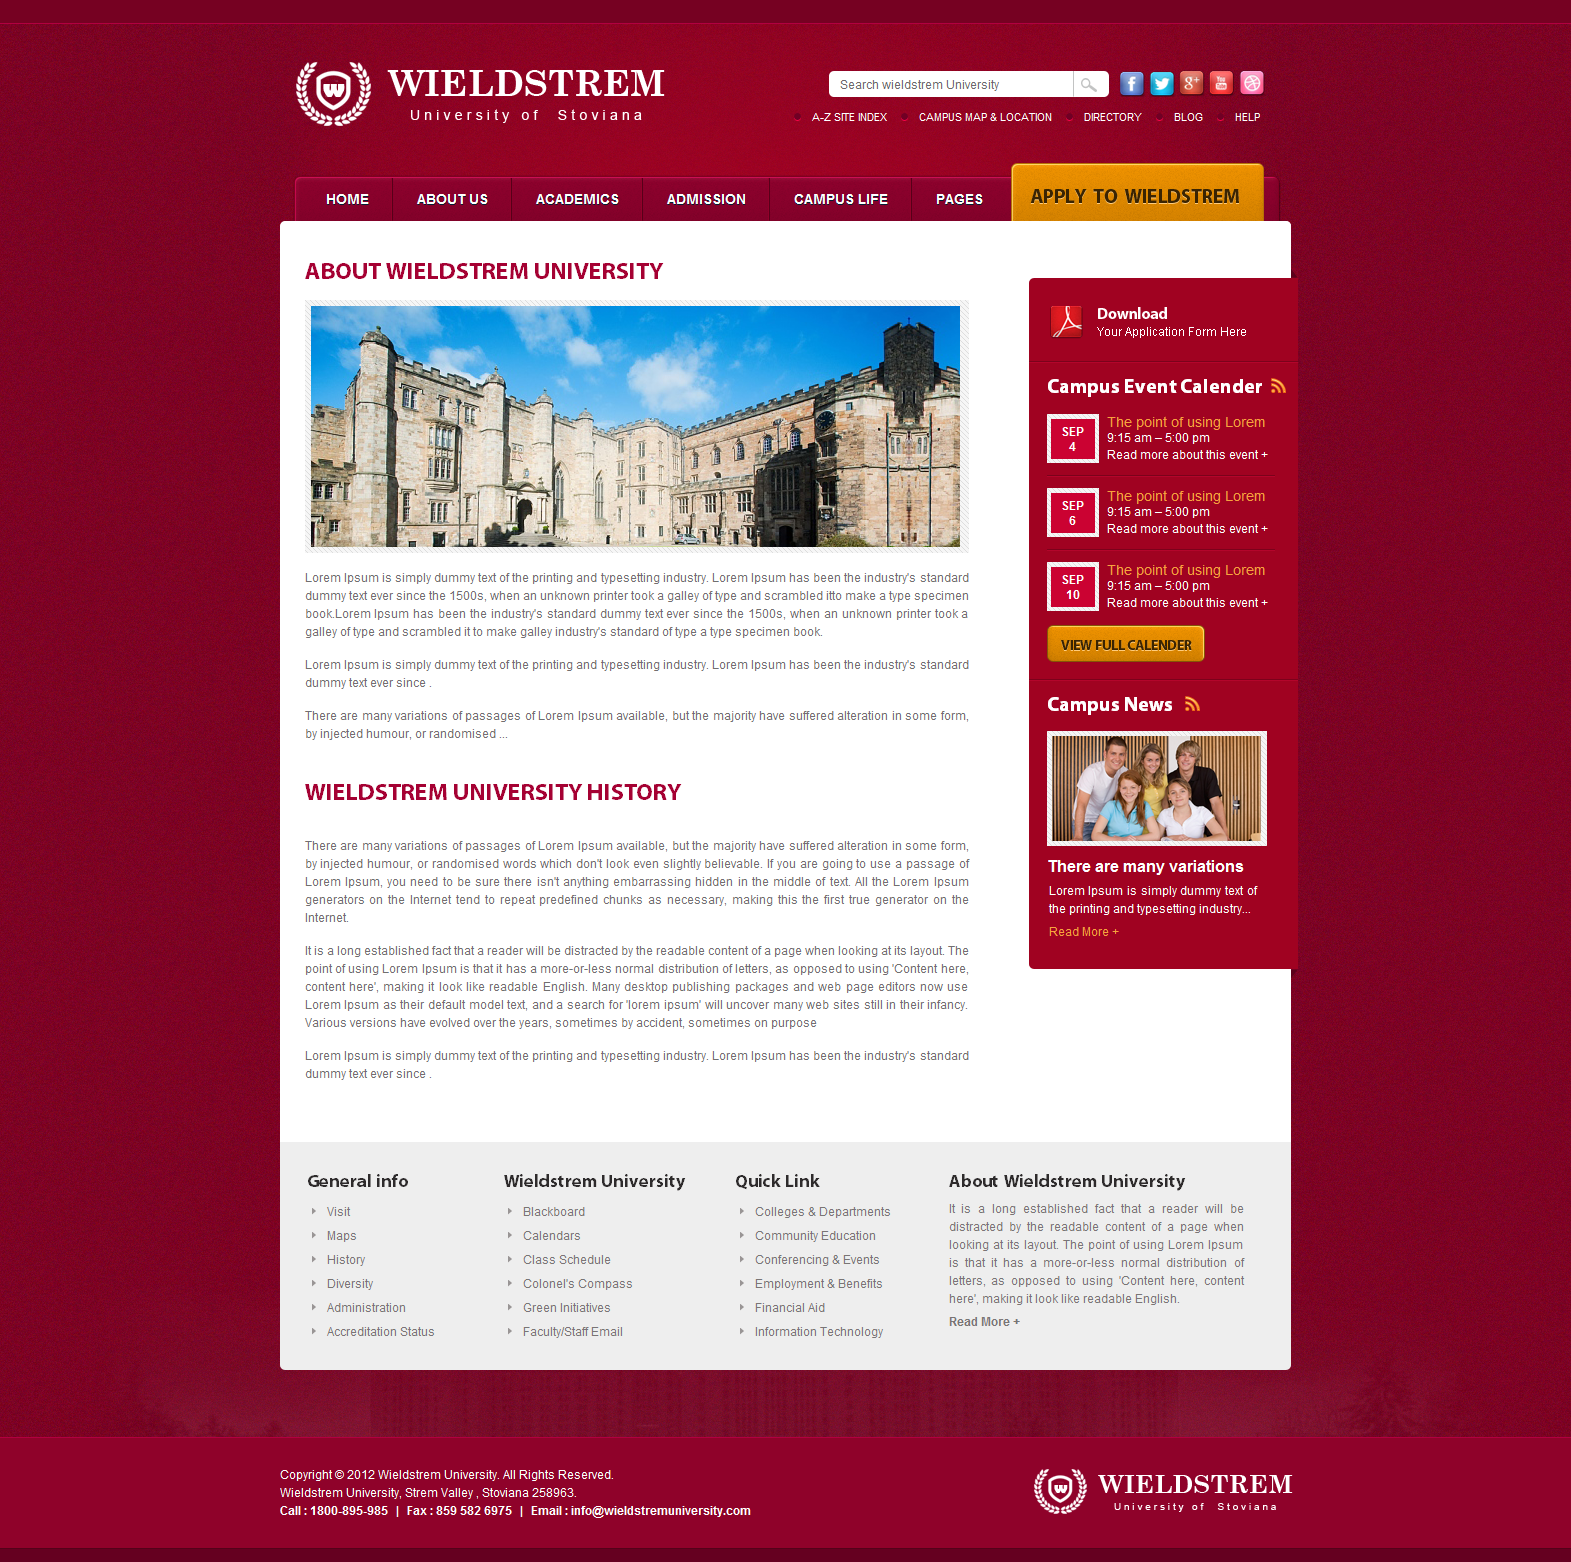 WieldStrem University